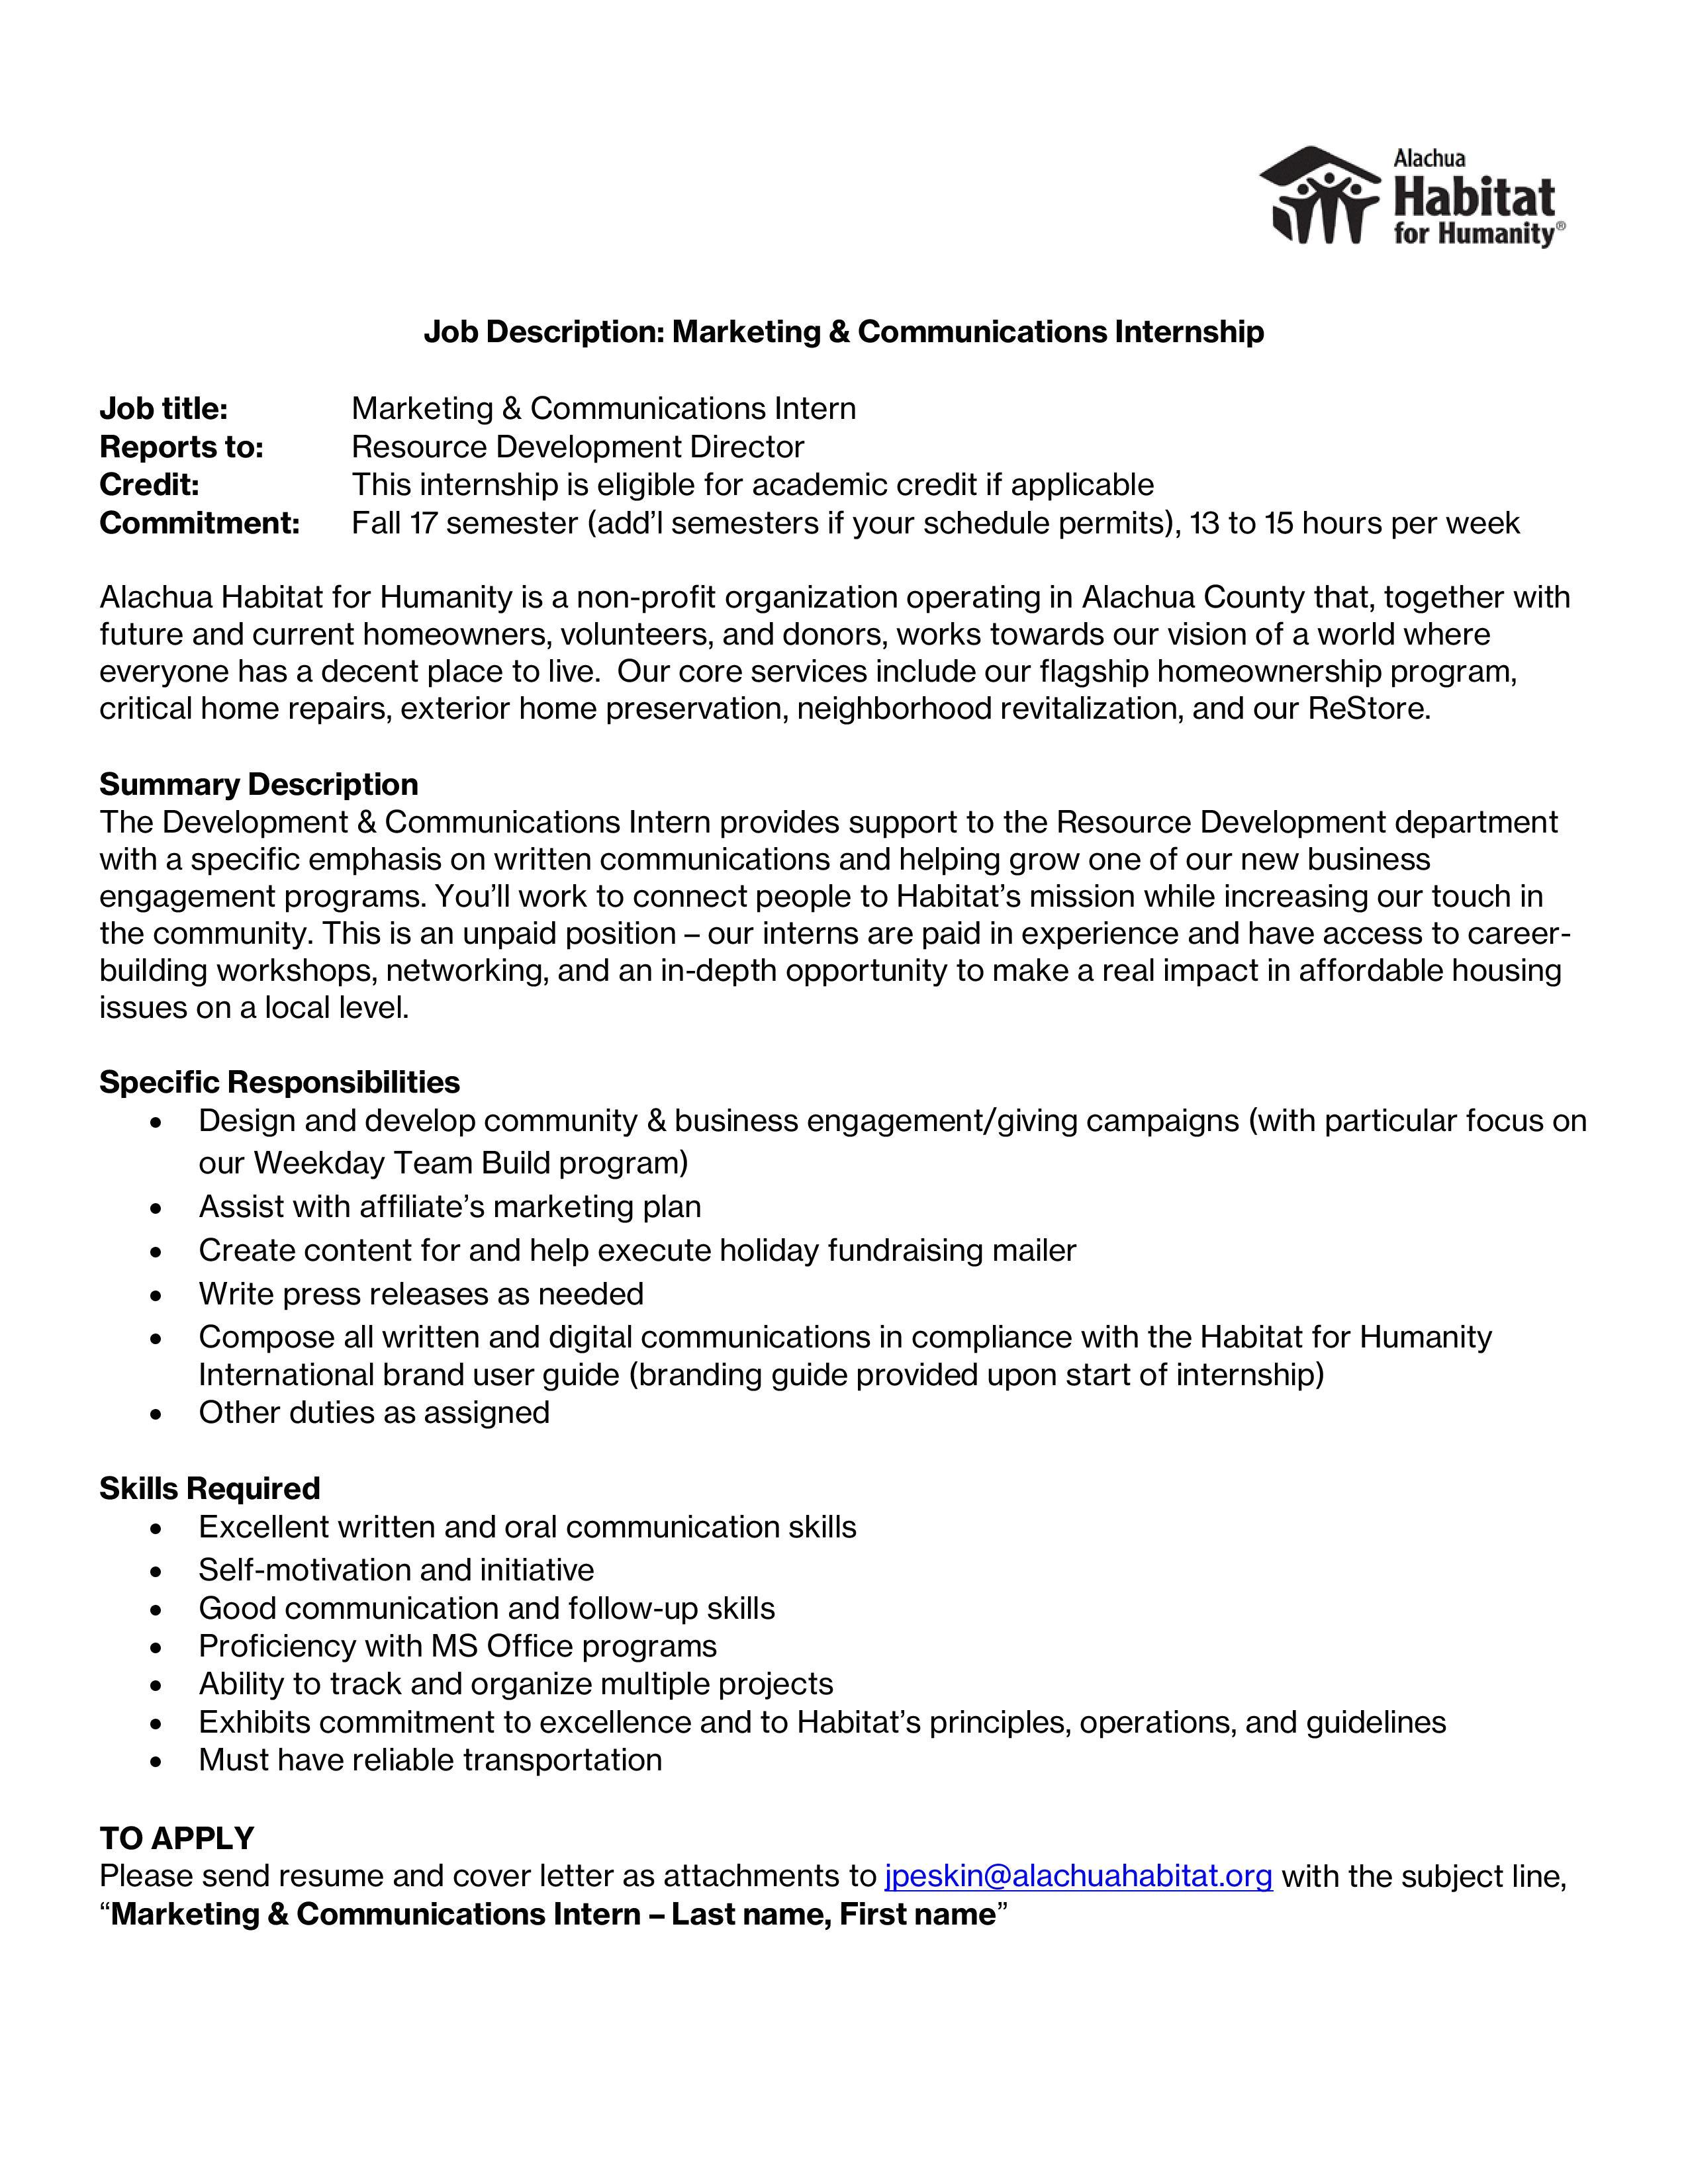 cover letter for internship communications